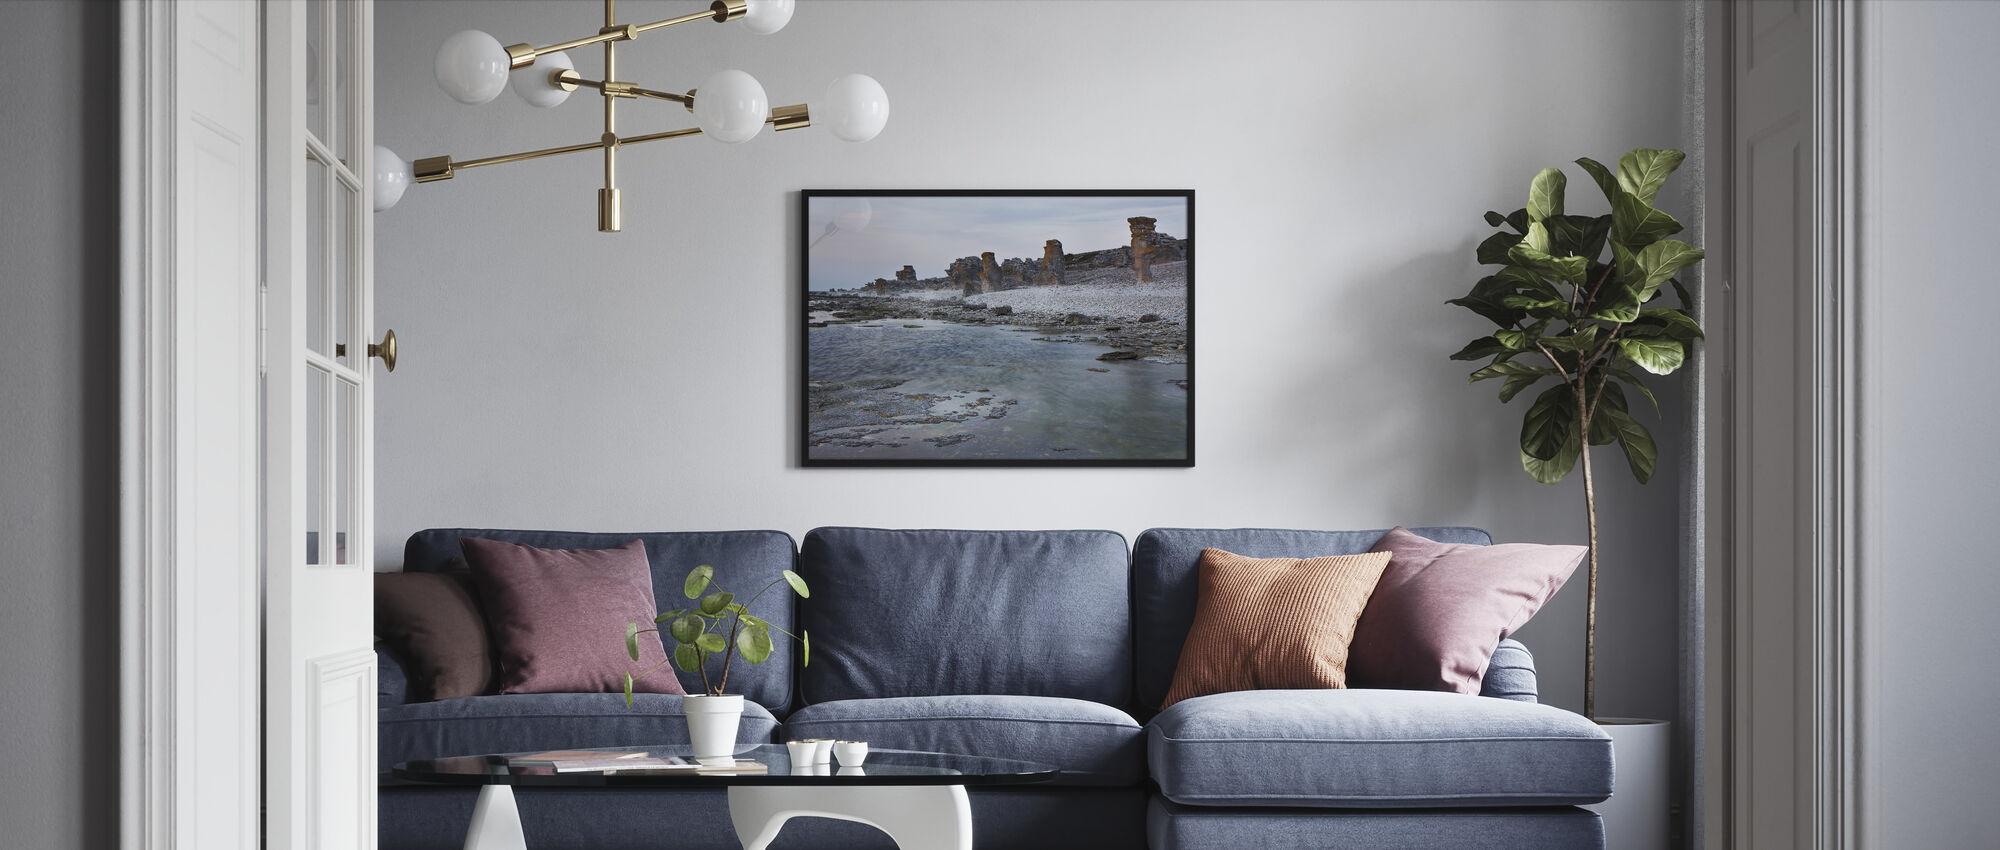 Gotlanti Rauk Beach - Kehystetty kuva - Olohuone